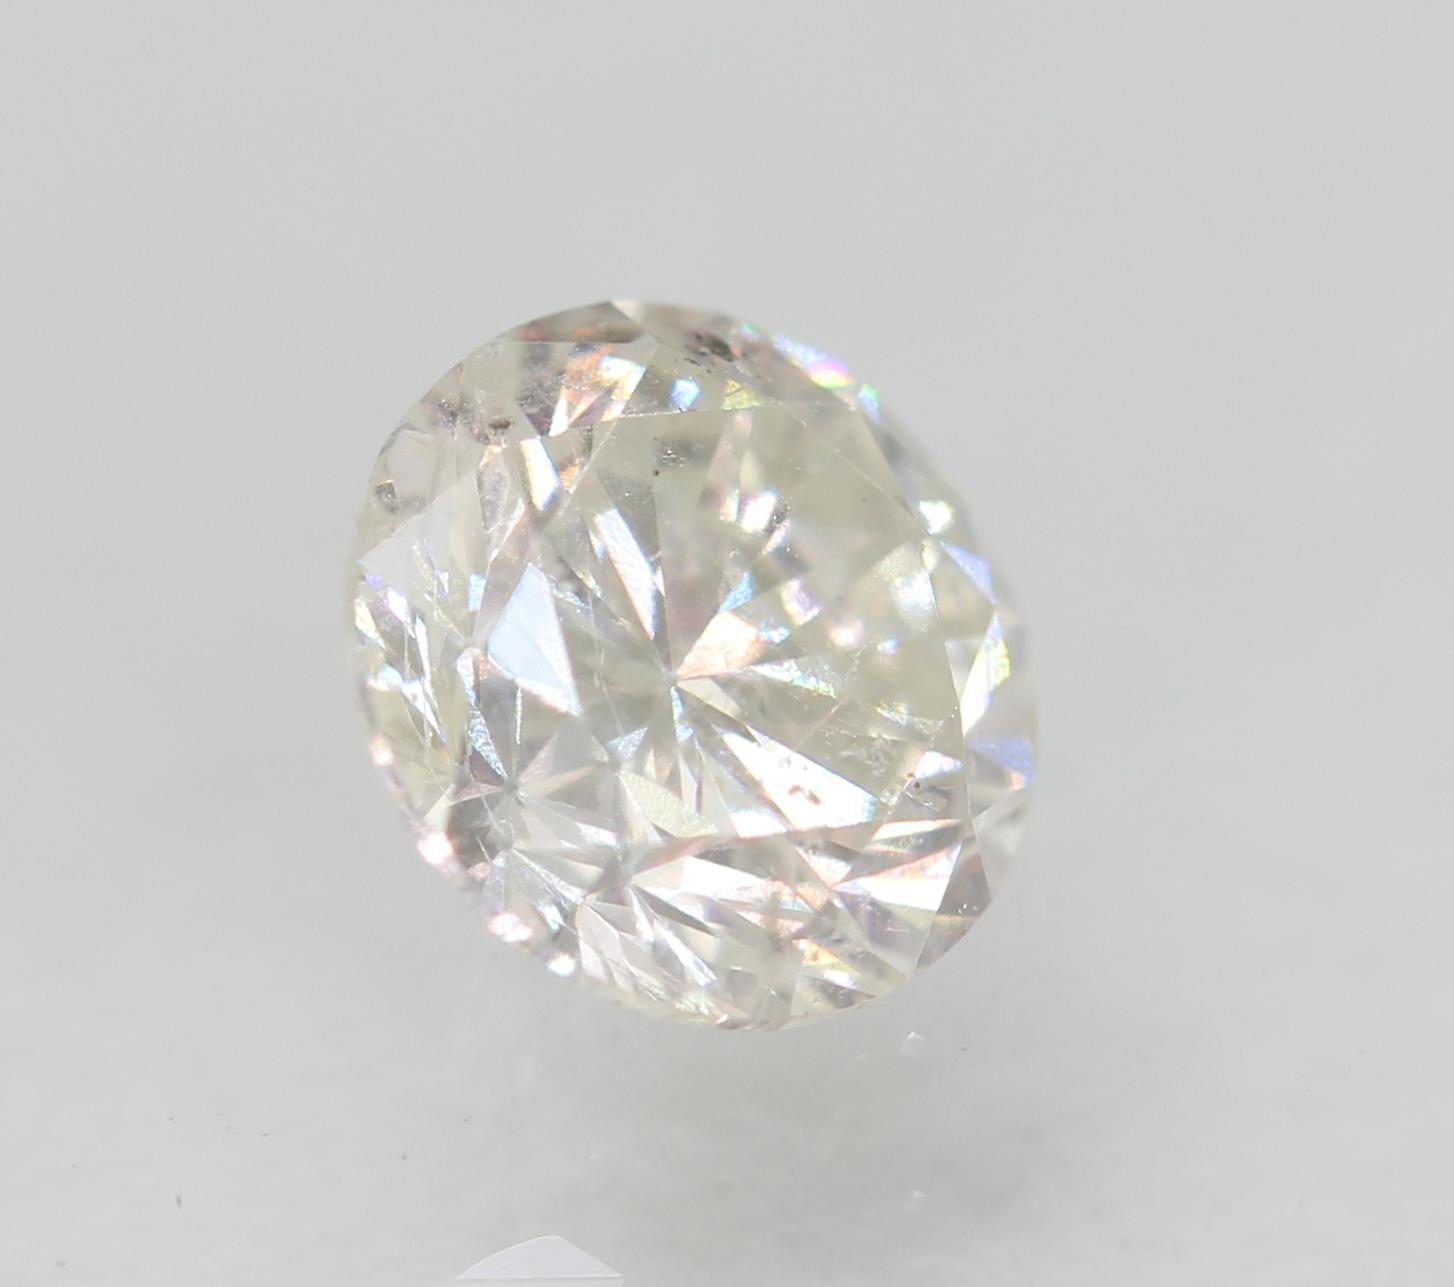 Certified 0.46 Carat F SI1 Round Brilliant Enhanced Natural Diamond 4.91m EX CUT